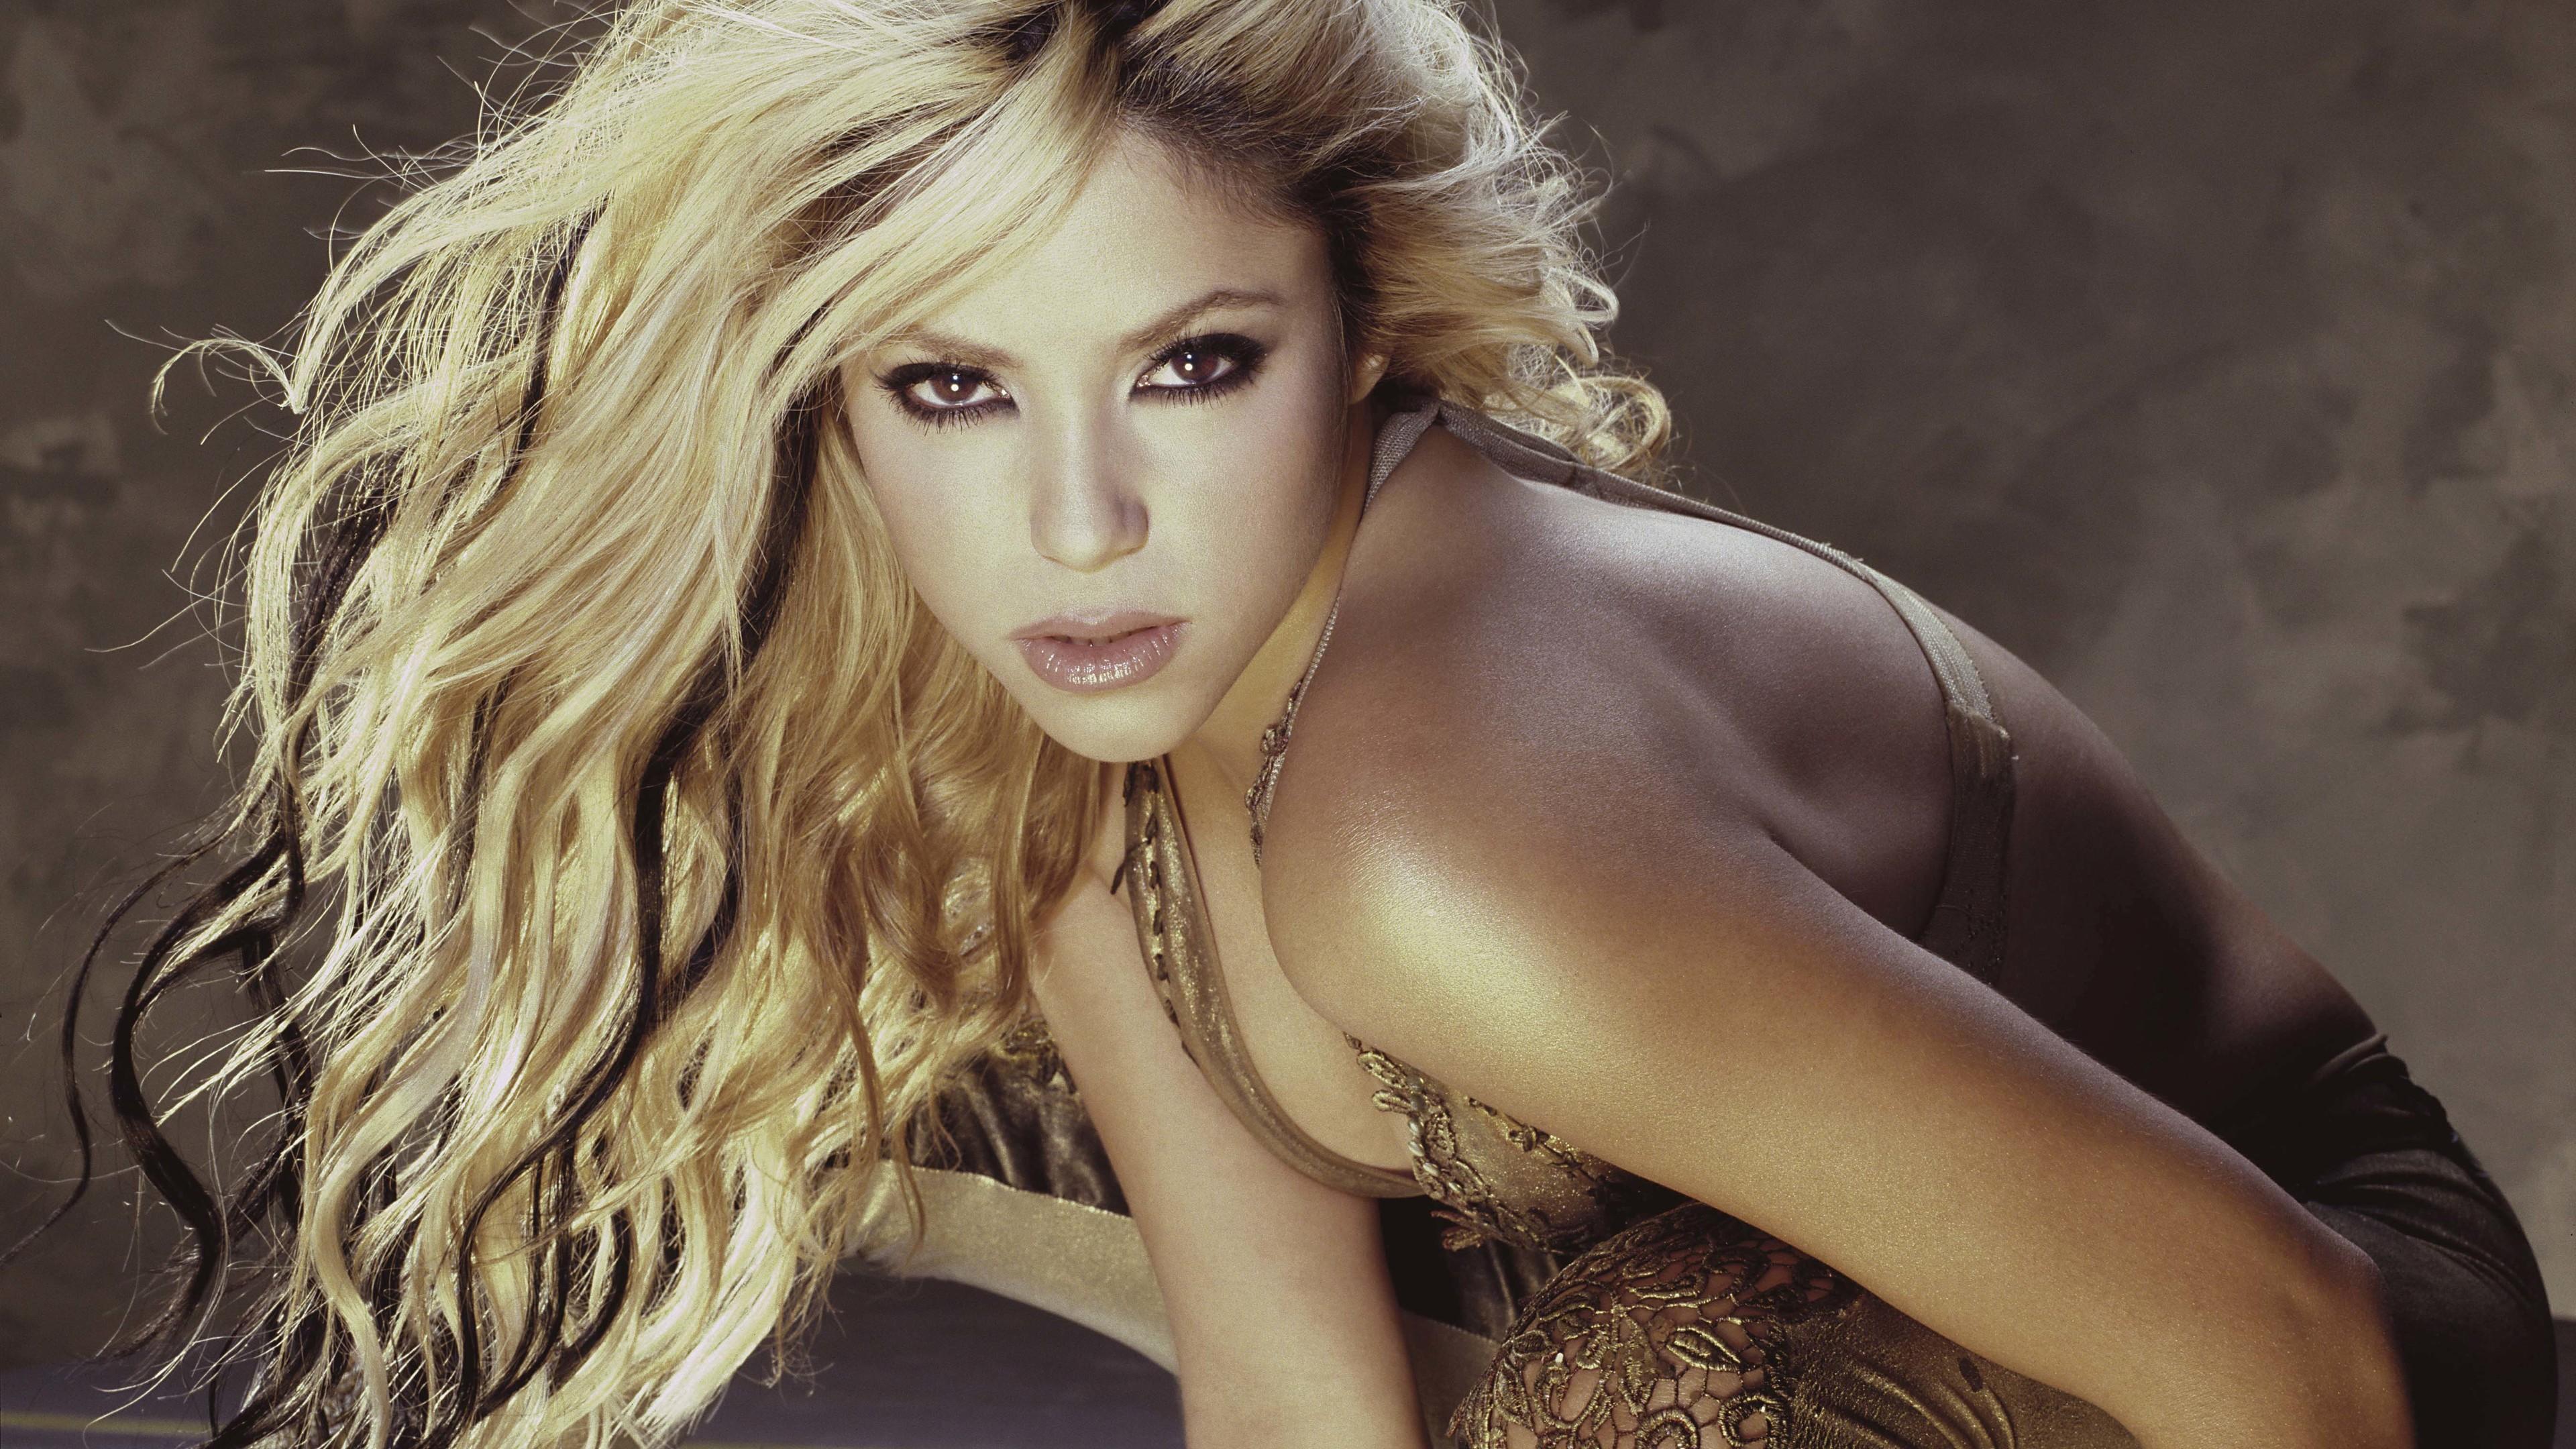 shakira 4k new 1558220635 - Shakira 4k New - shakira wallpapers, music wallpapers, hd-wallpapers, girls wallpapers, celebrities wallpapers, 4k-wallpapers